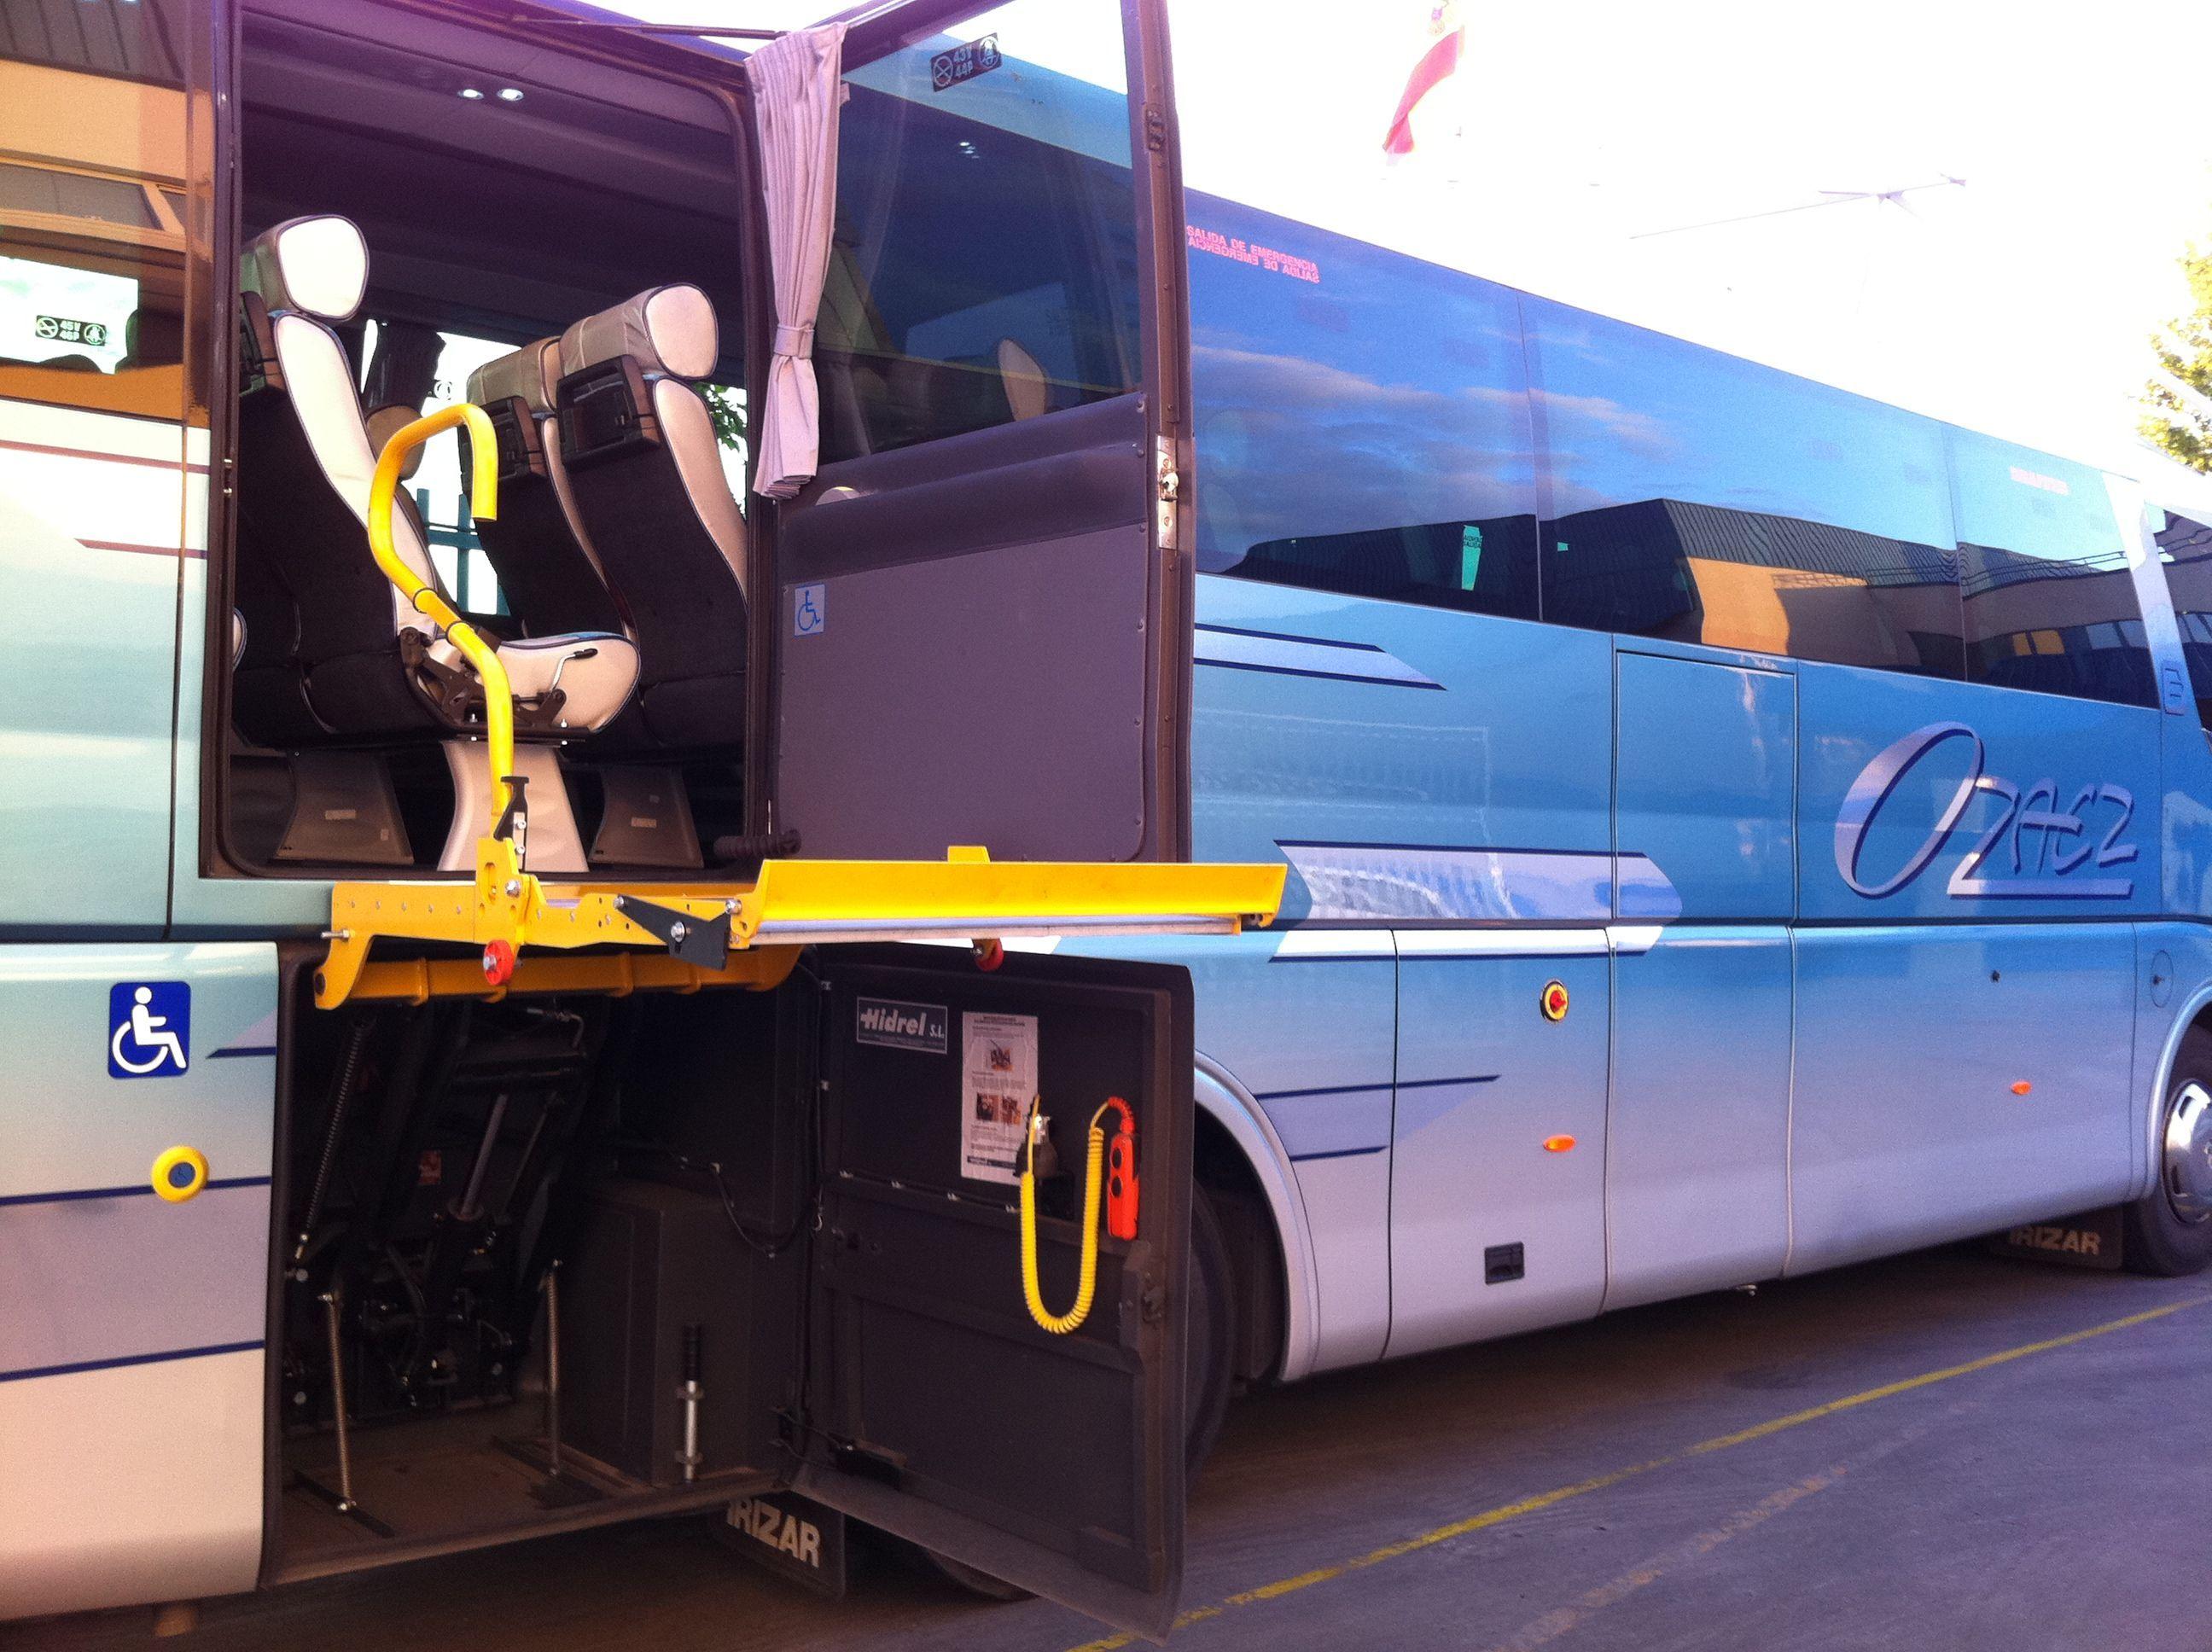 Servicios para agencias: Servicios de Autocares Ozaez